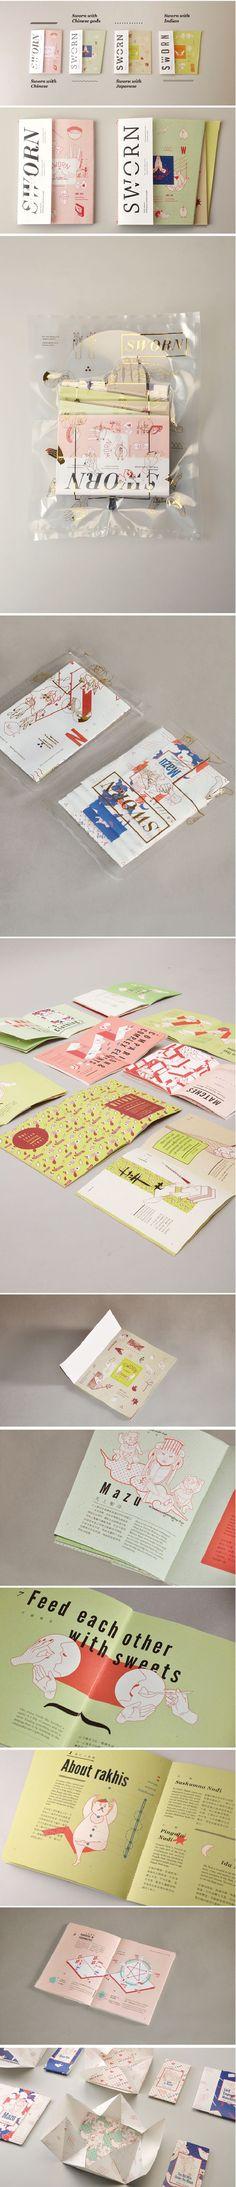 SWORN \ Editorial Design, Graphic Design, Illustration \ youwen cao \ Taipei, Taiwan